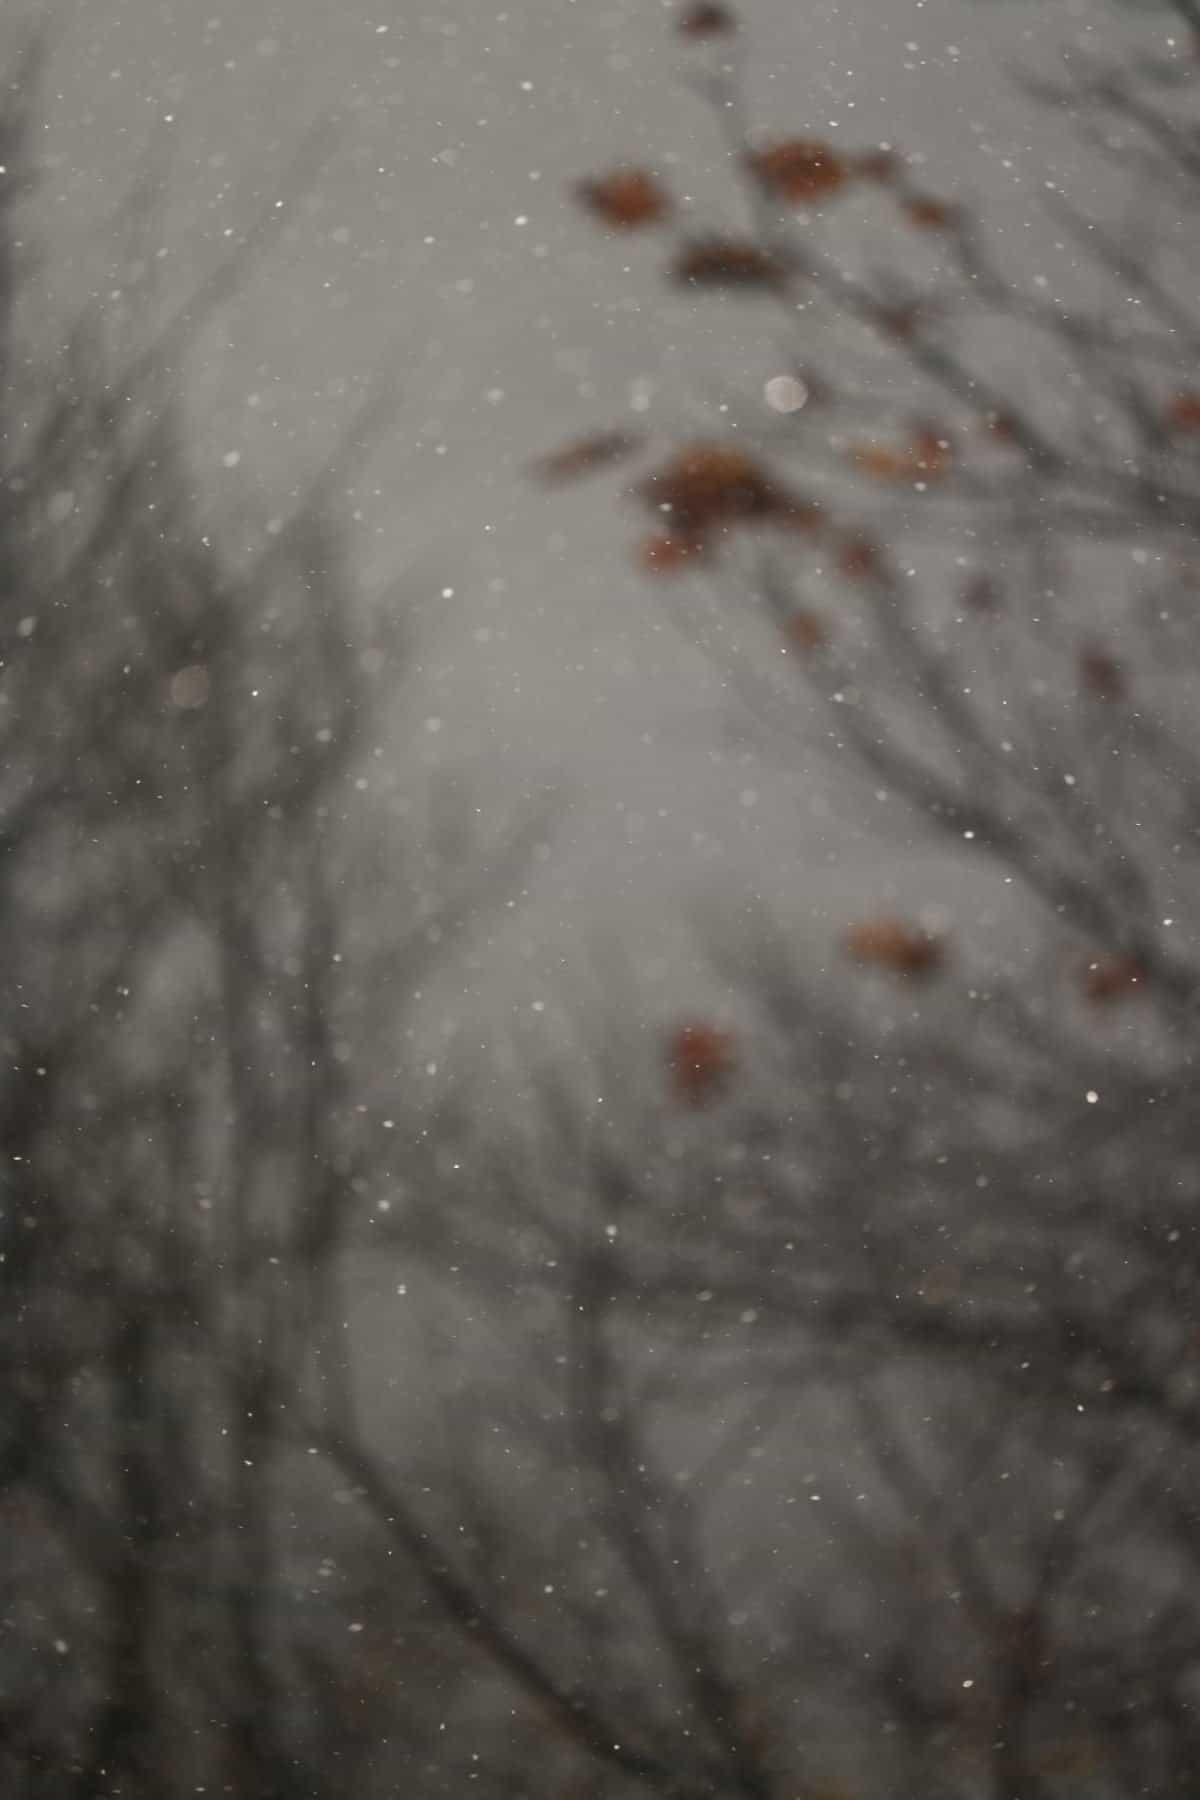 snow falling between trees